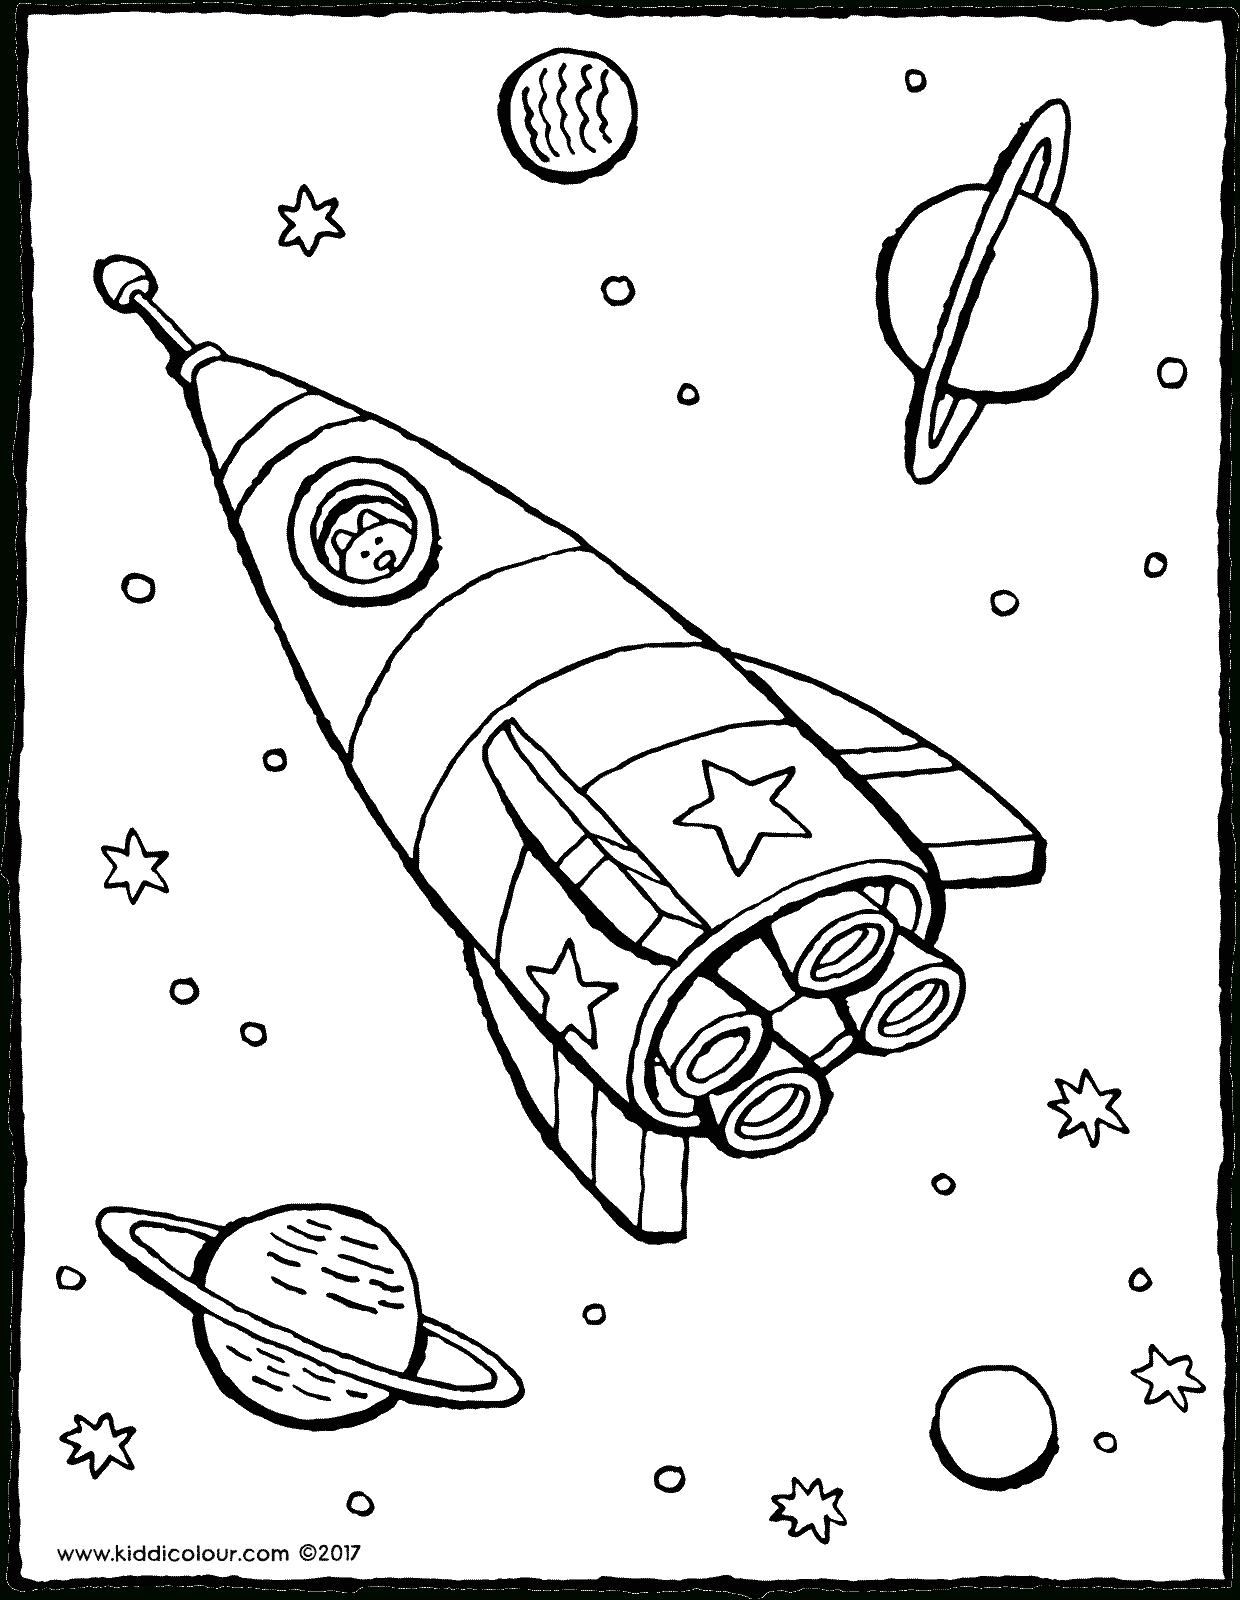 Rakete Im Weltraum - Kiddimalseite in Ausmalbild Rakete